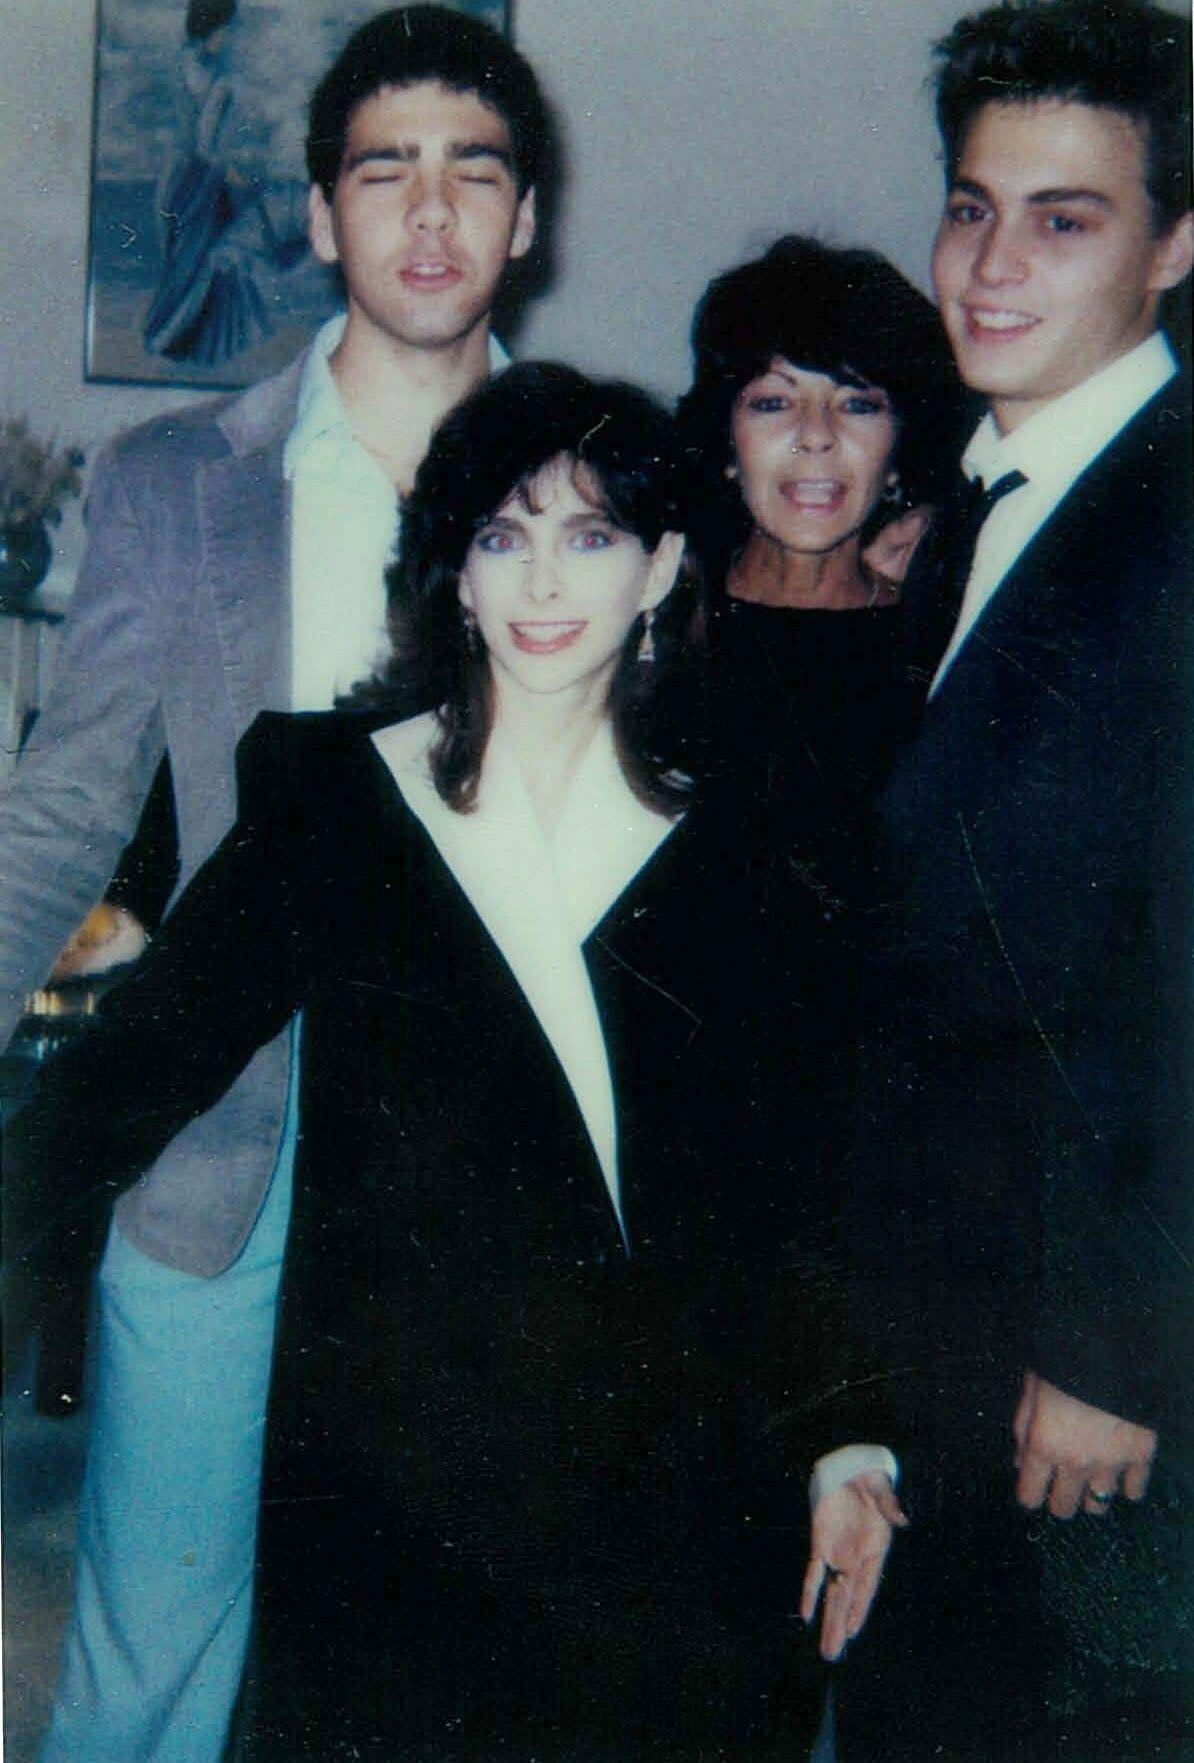 Johnny Depp Photo Wedding With Lori Anne Allison 1983 Johnny Depp Johnny Depp Images Johnny